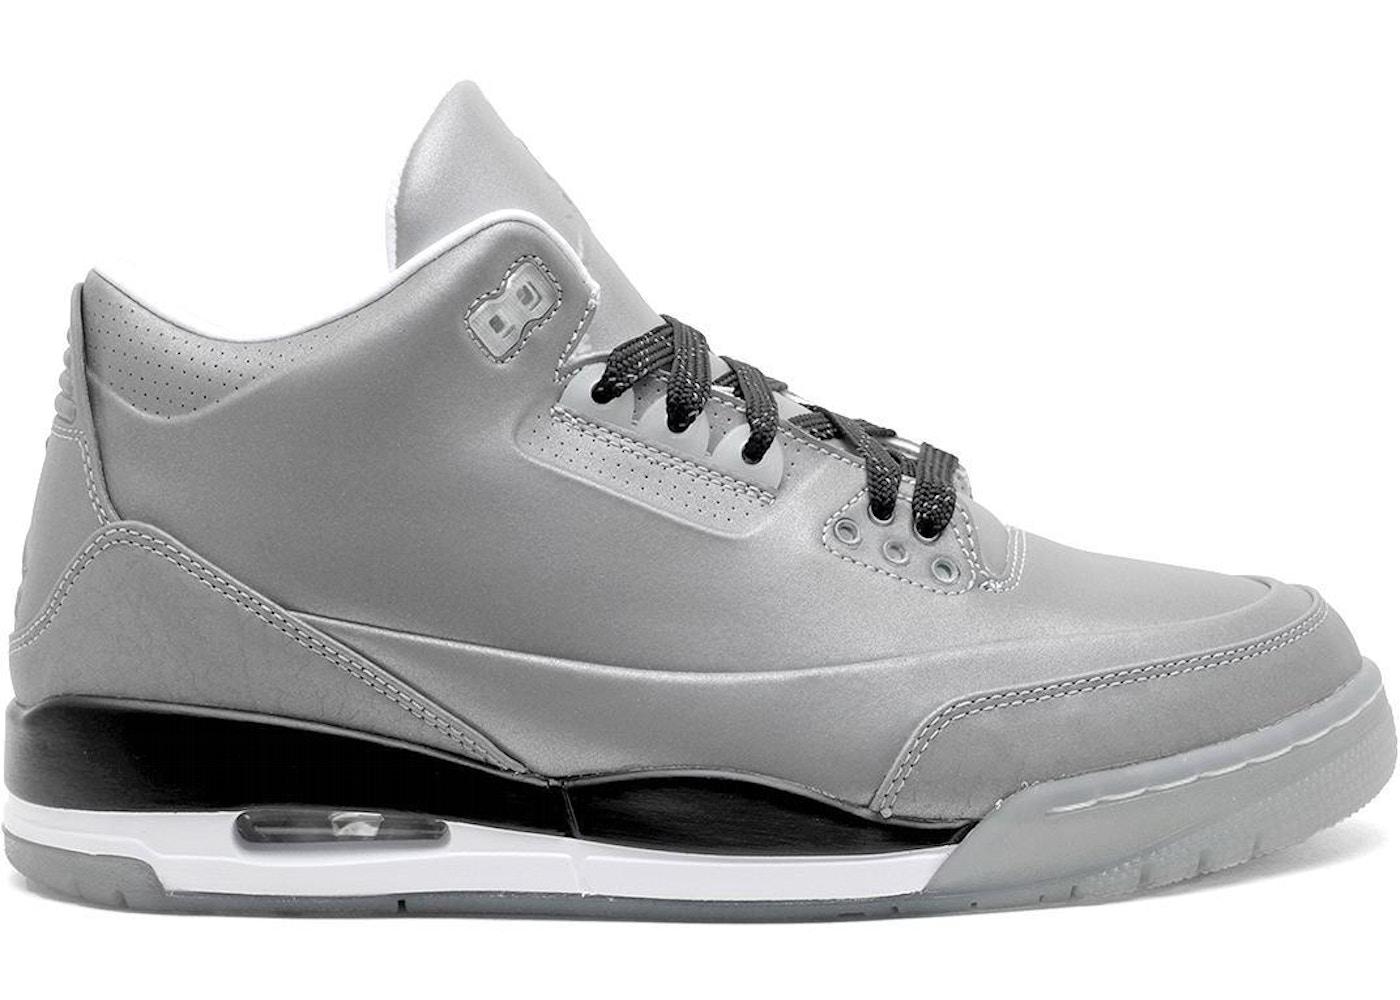 promo code 5f661 ef7b2 Air Jordan 3 Size 18 Shoes - Release Date